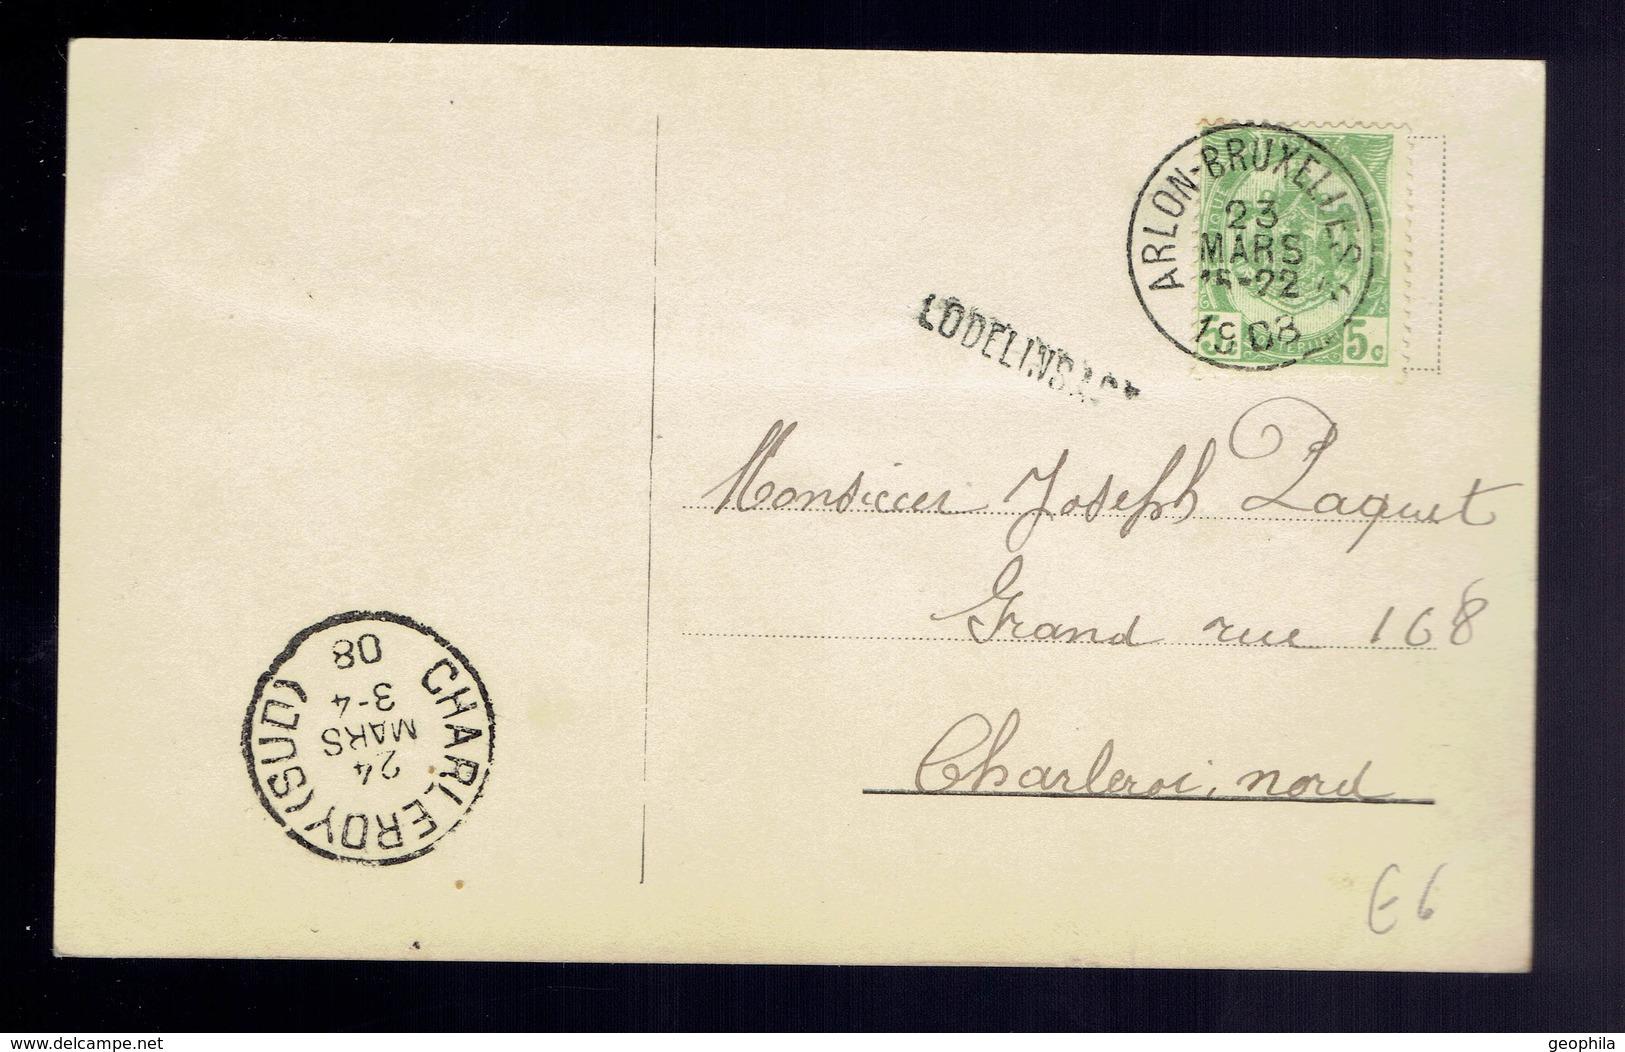 CP Fantaisie De Griffe D'origine Lodelinsart / Ambulant Arlon-Bruxelles 2 23 Mars 1908 => Charleroi-Nord - Poststempel